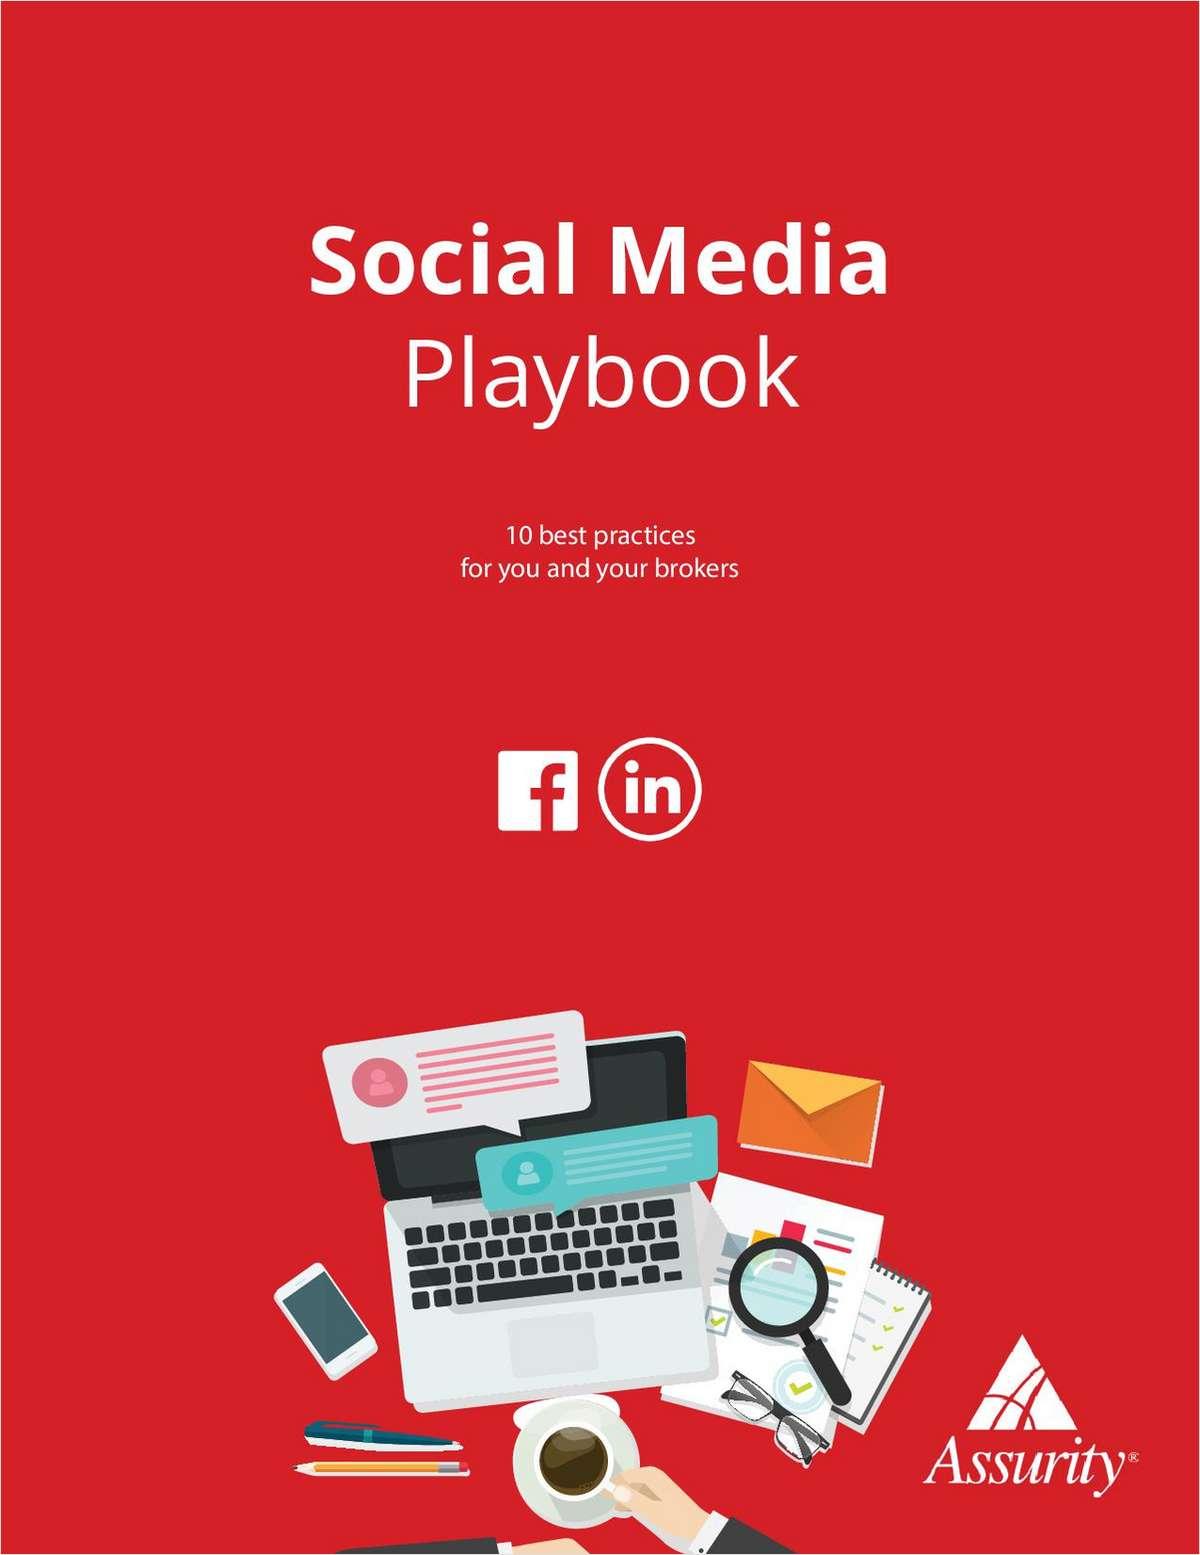 Social Media Playbook: 10 Best Practices for Brokers